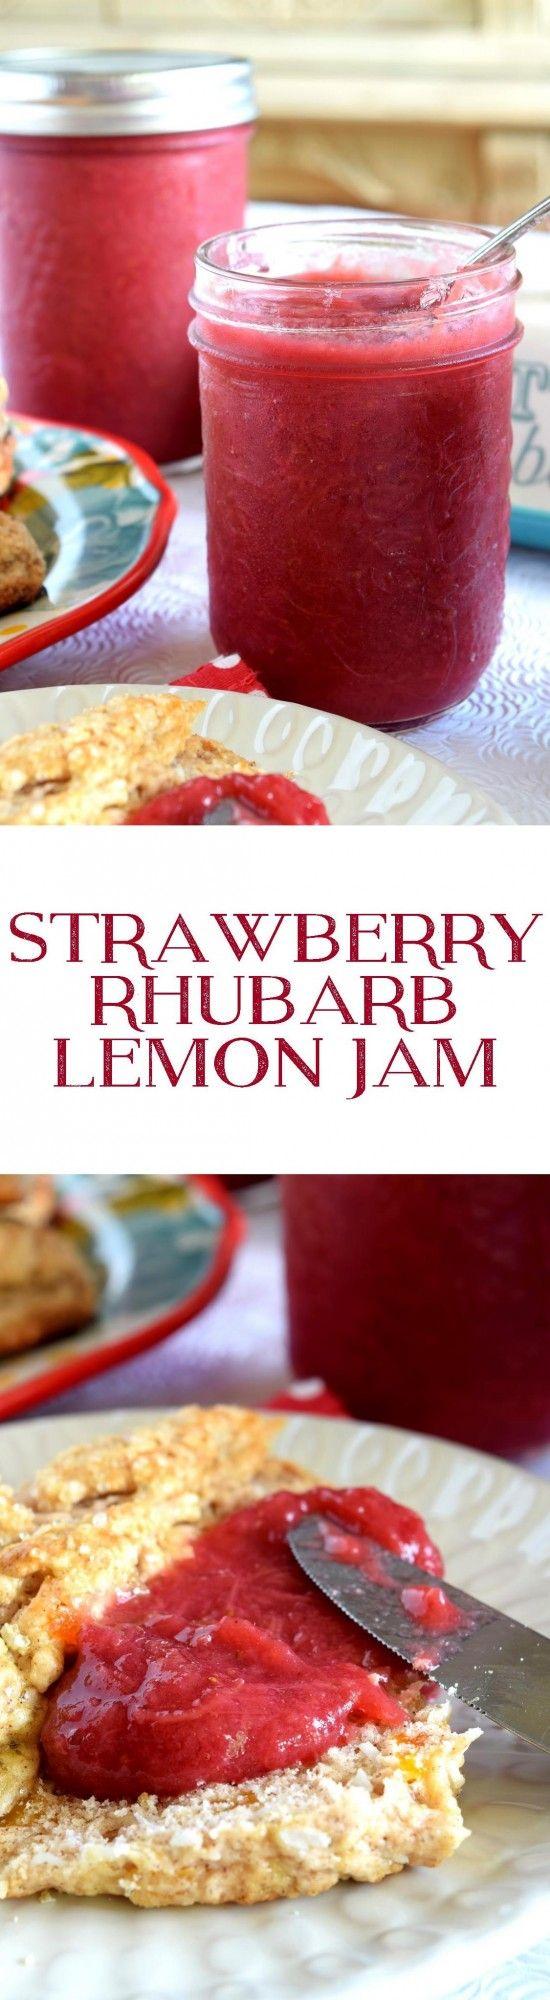 Strawberry Rhubarb Lemon Jam - Lord Byron's Kitchen